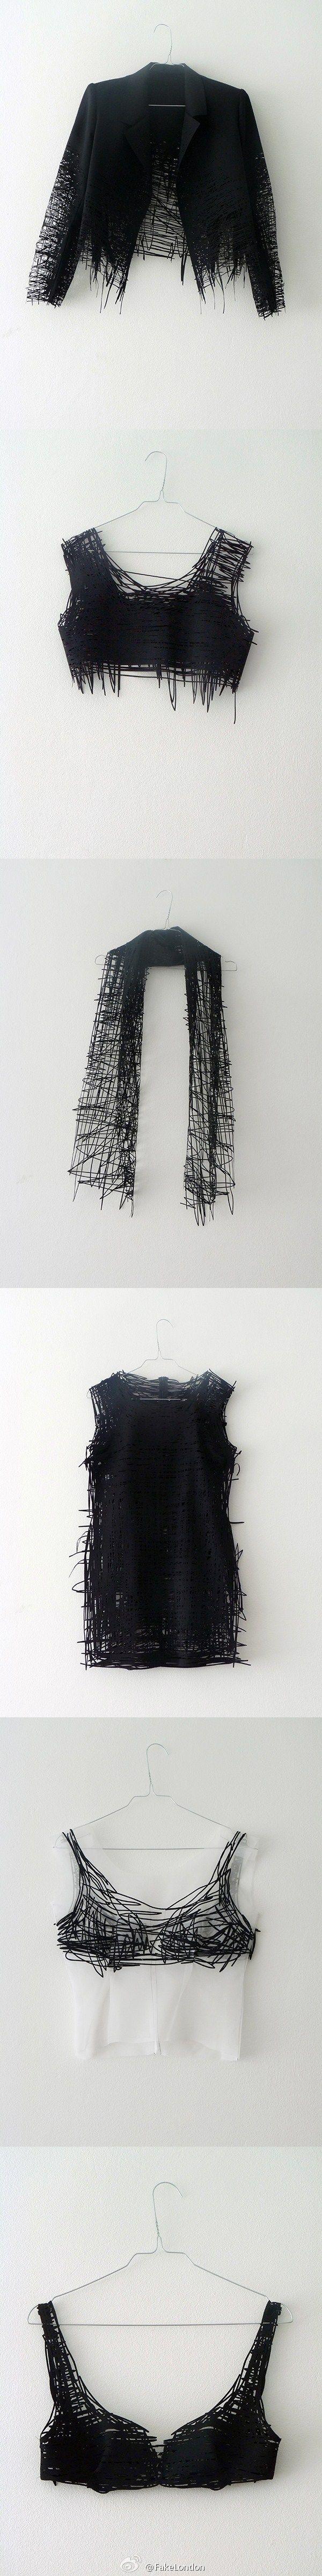 Designer Elvira 't Hart - a recent fashion graduate who translates 2D sketches to 3D laser-cut pieces